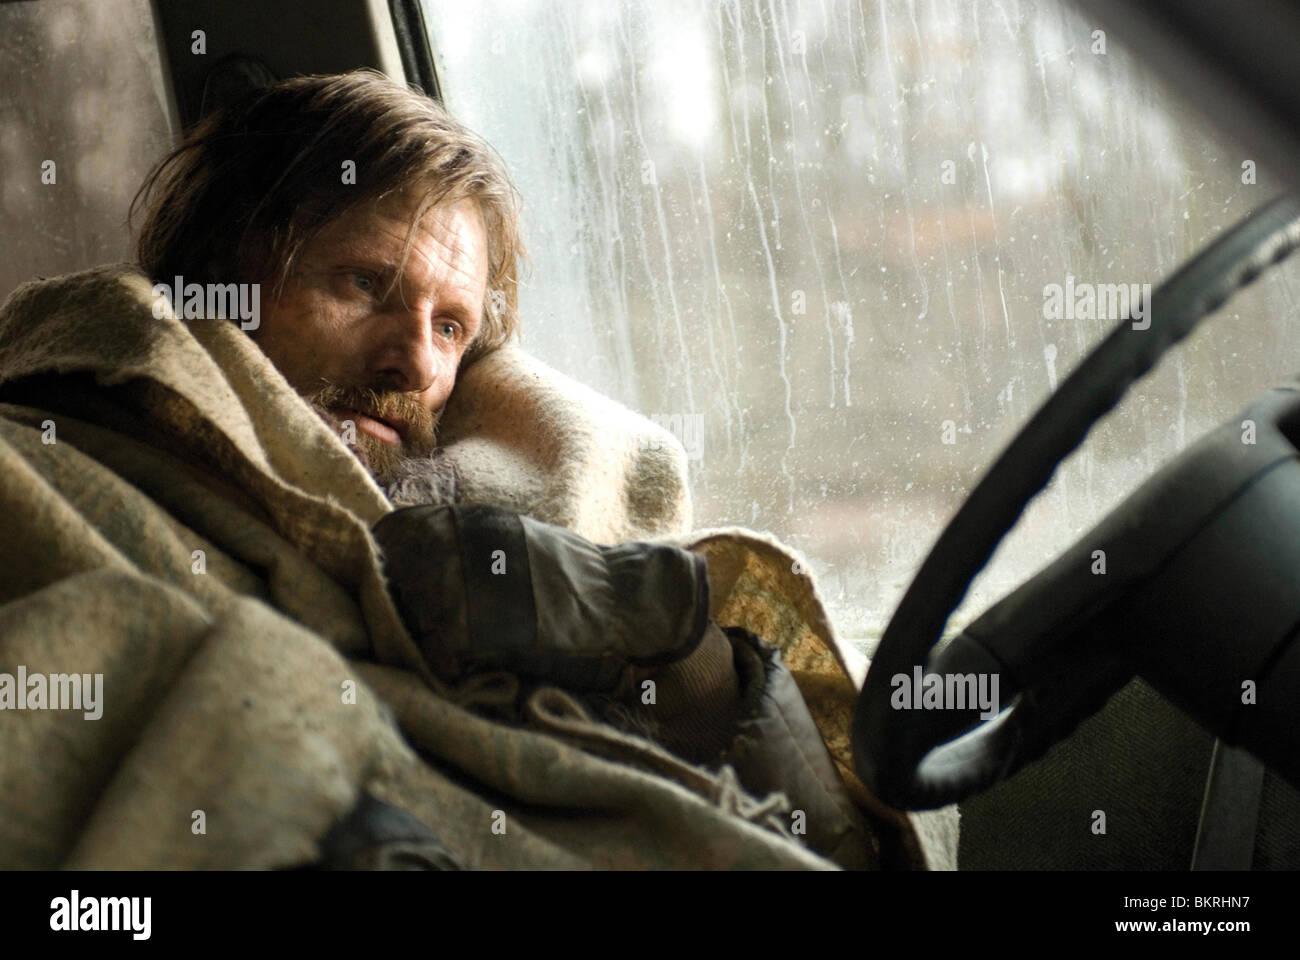 THE ROAD (2009) VIGGO MORTENSEN JOHN HILLCOAT (DIR) 003 - Stock Image